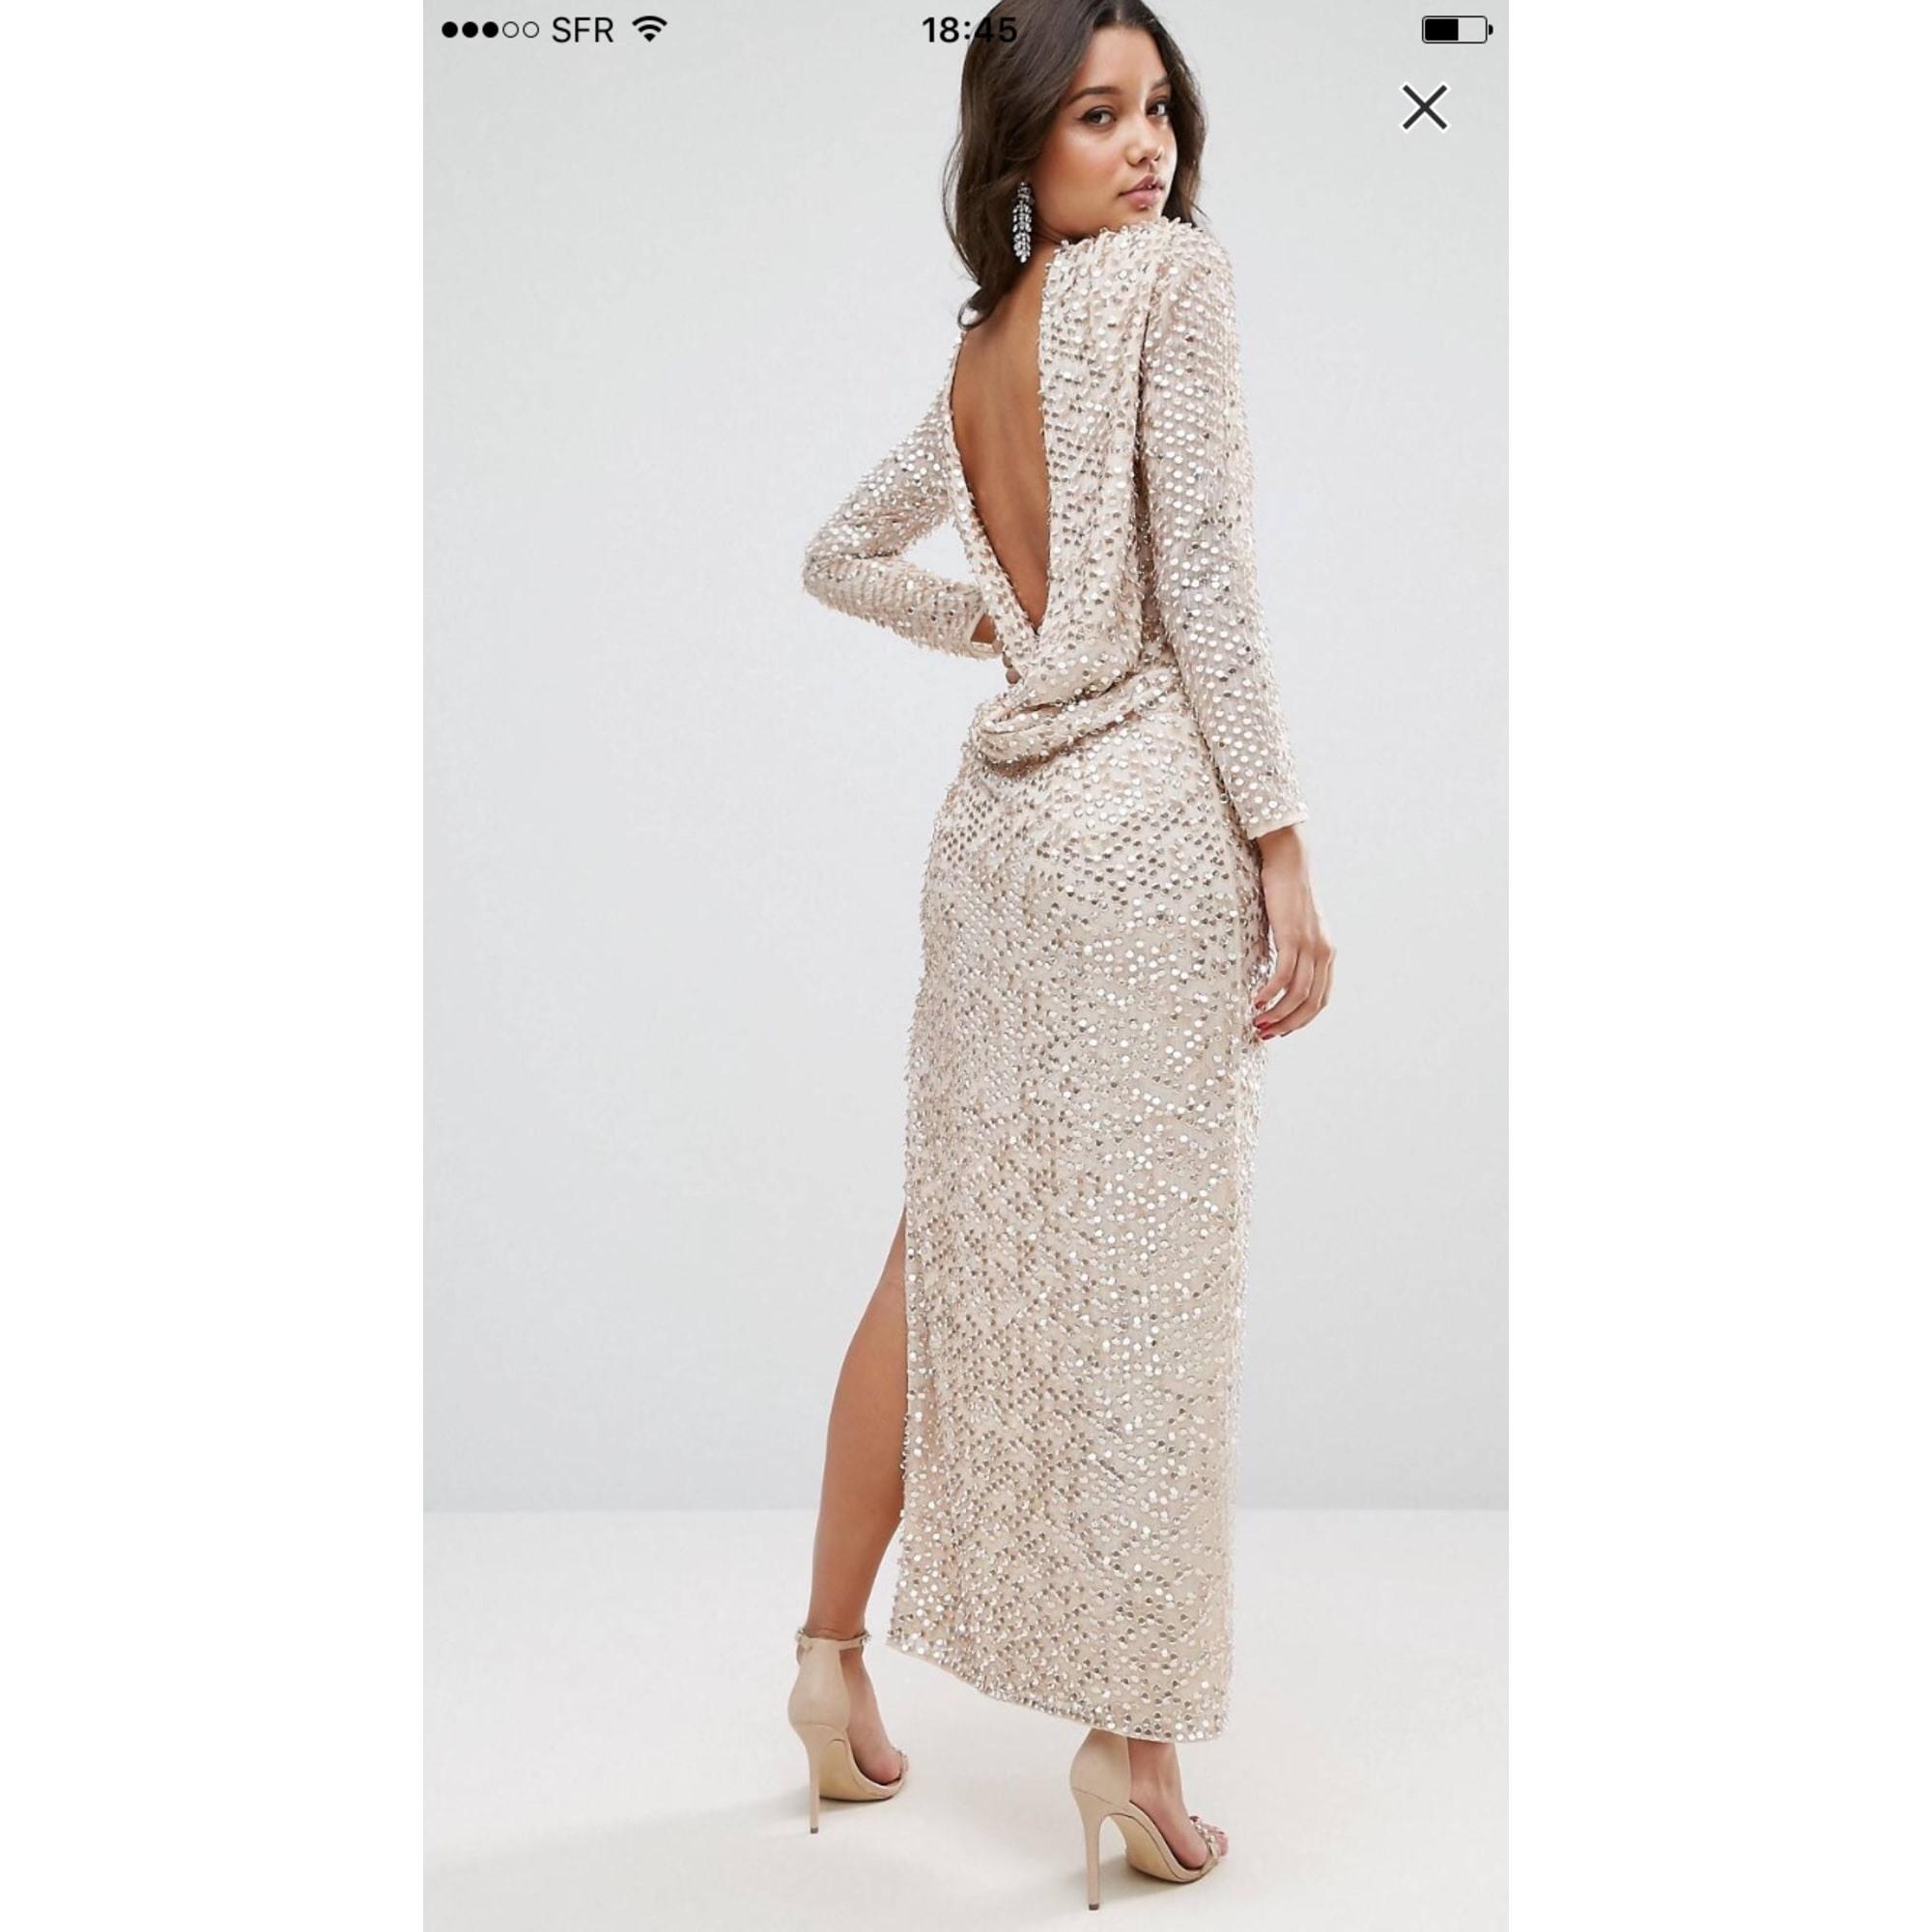 13 Kreativ Rückenfreies Kleid VertriebDesigner Schön Rückenfreies Kleid Ärmel